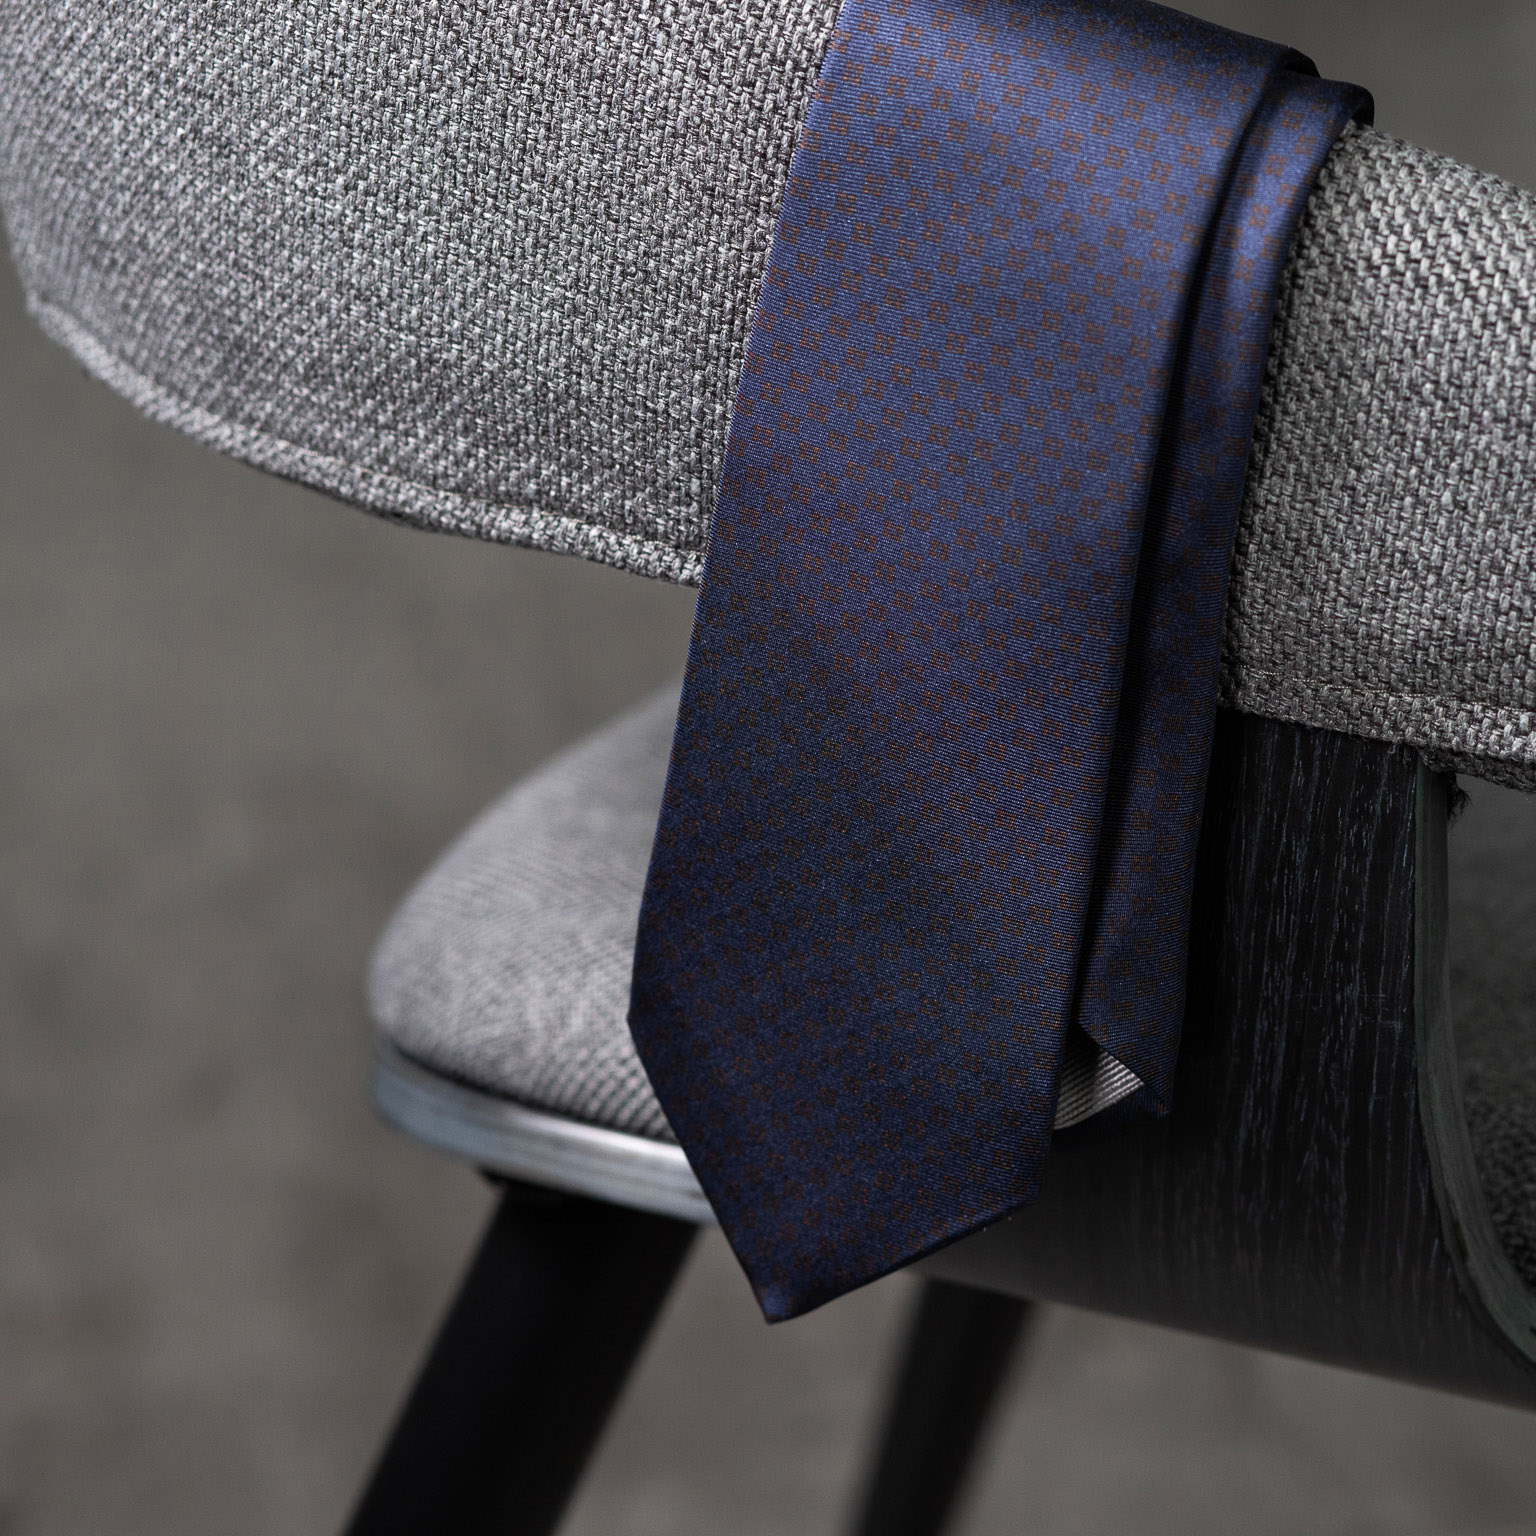 PRINTED-SILK-SEDA-ESTAMPADA-0582-Tie-Initials-Corbata-Iniciales-The-Seelk-3